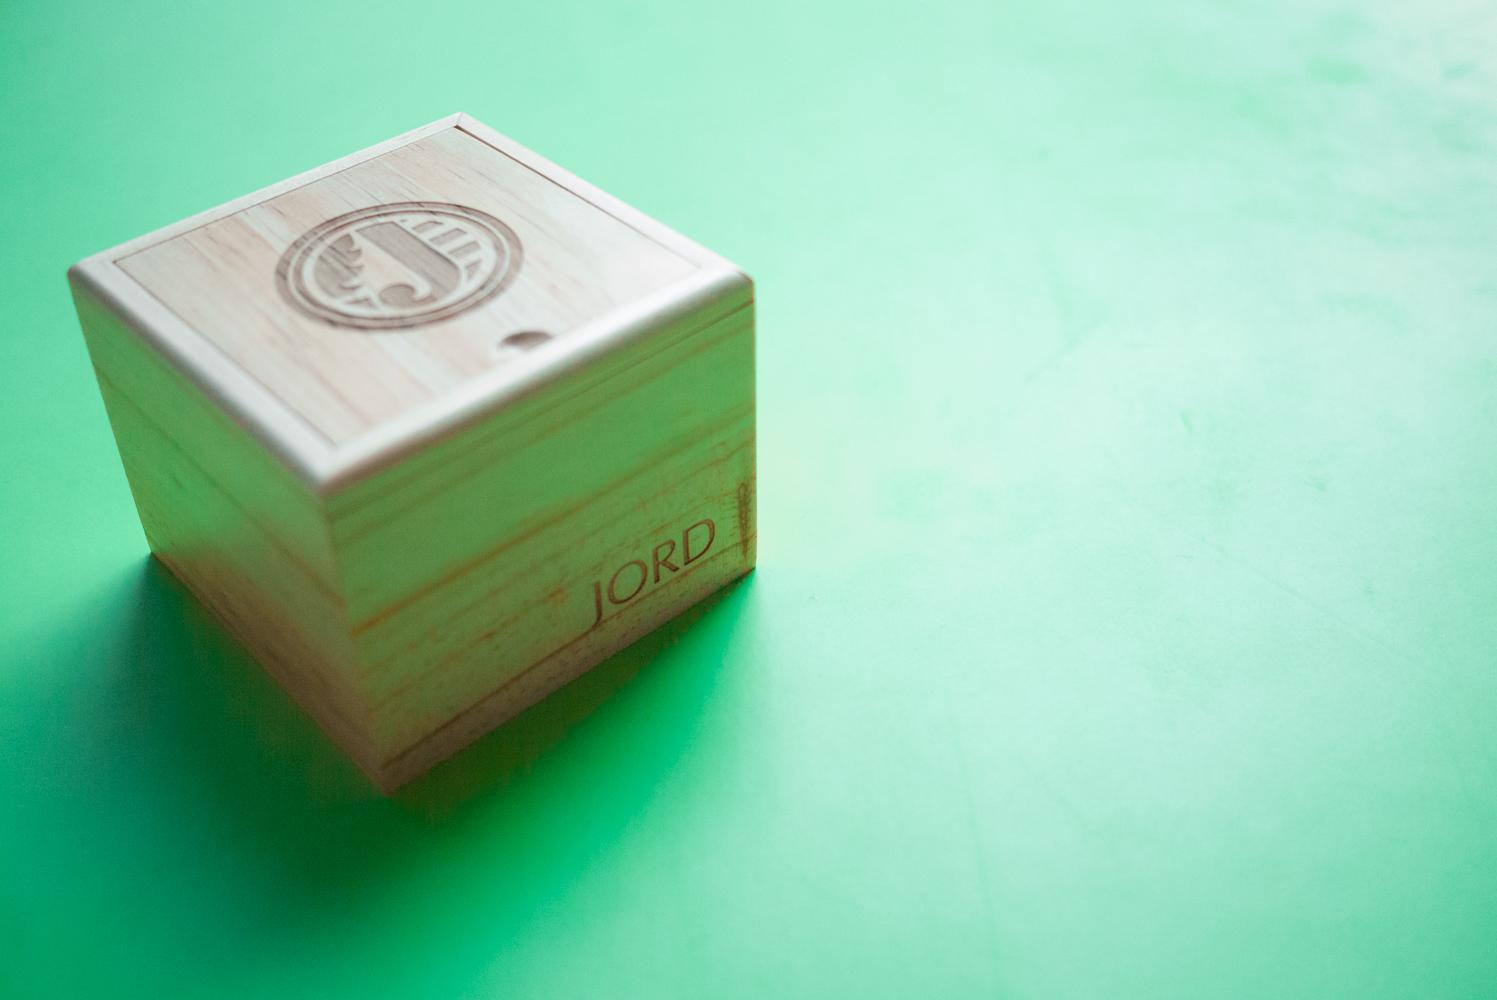 Jord wood box